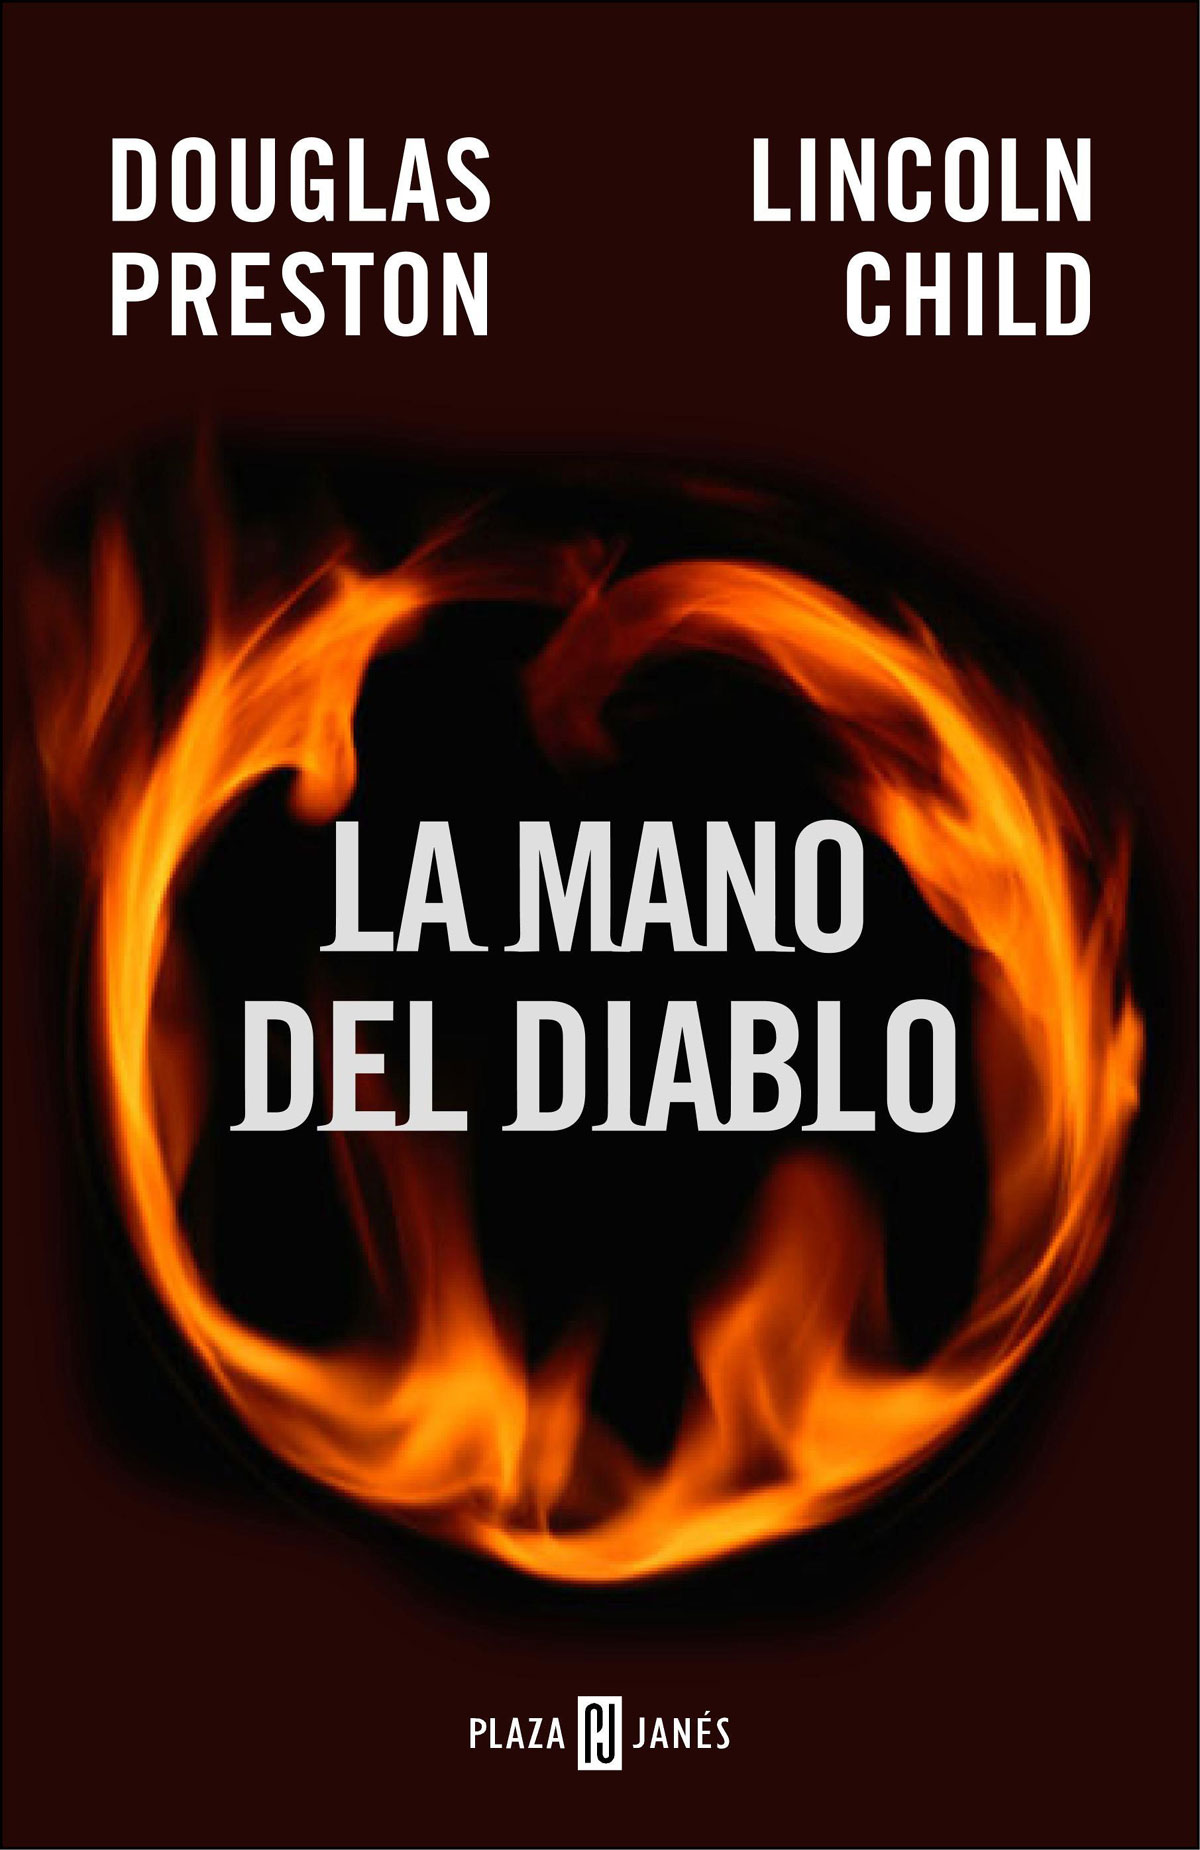 Portada de la novela La mano del diablo, de Douglas Preston y Lincoln Child